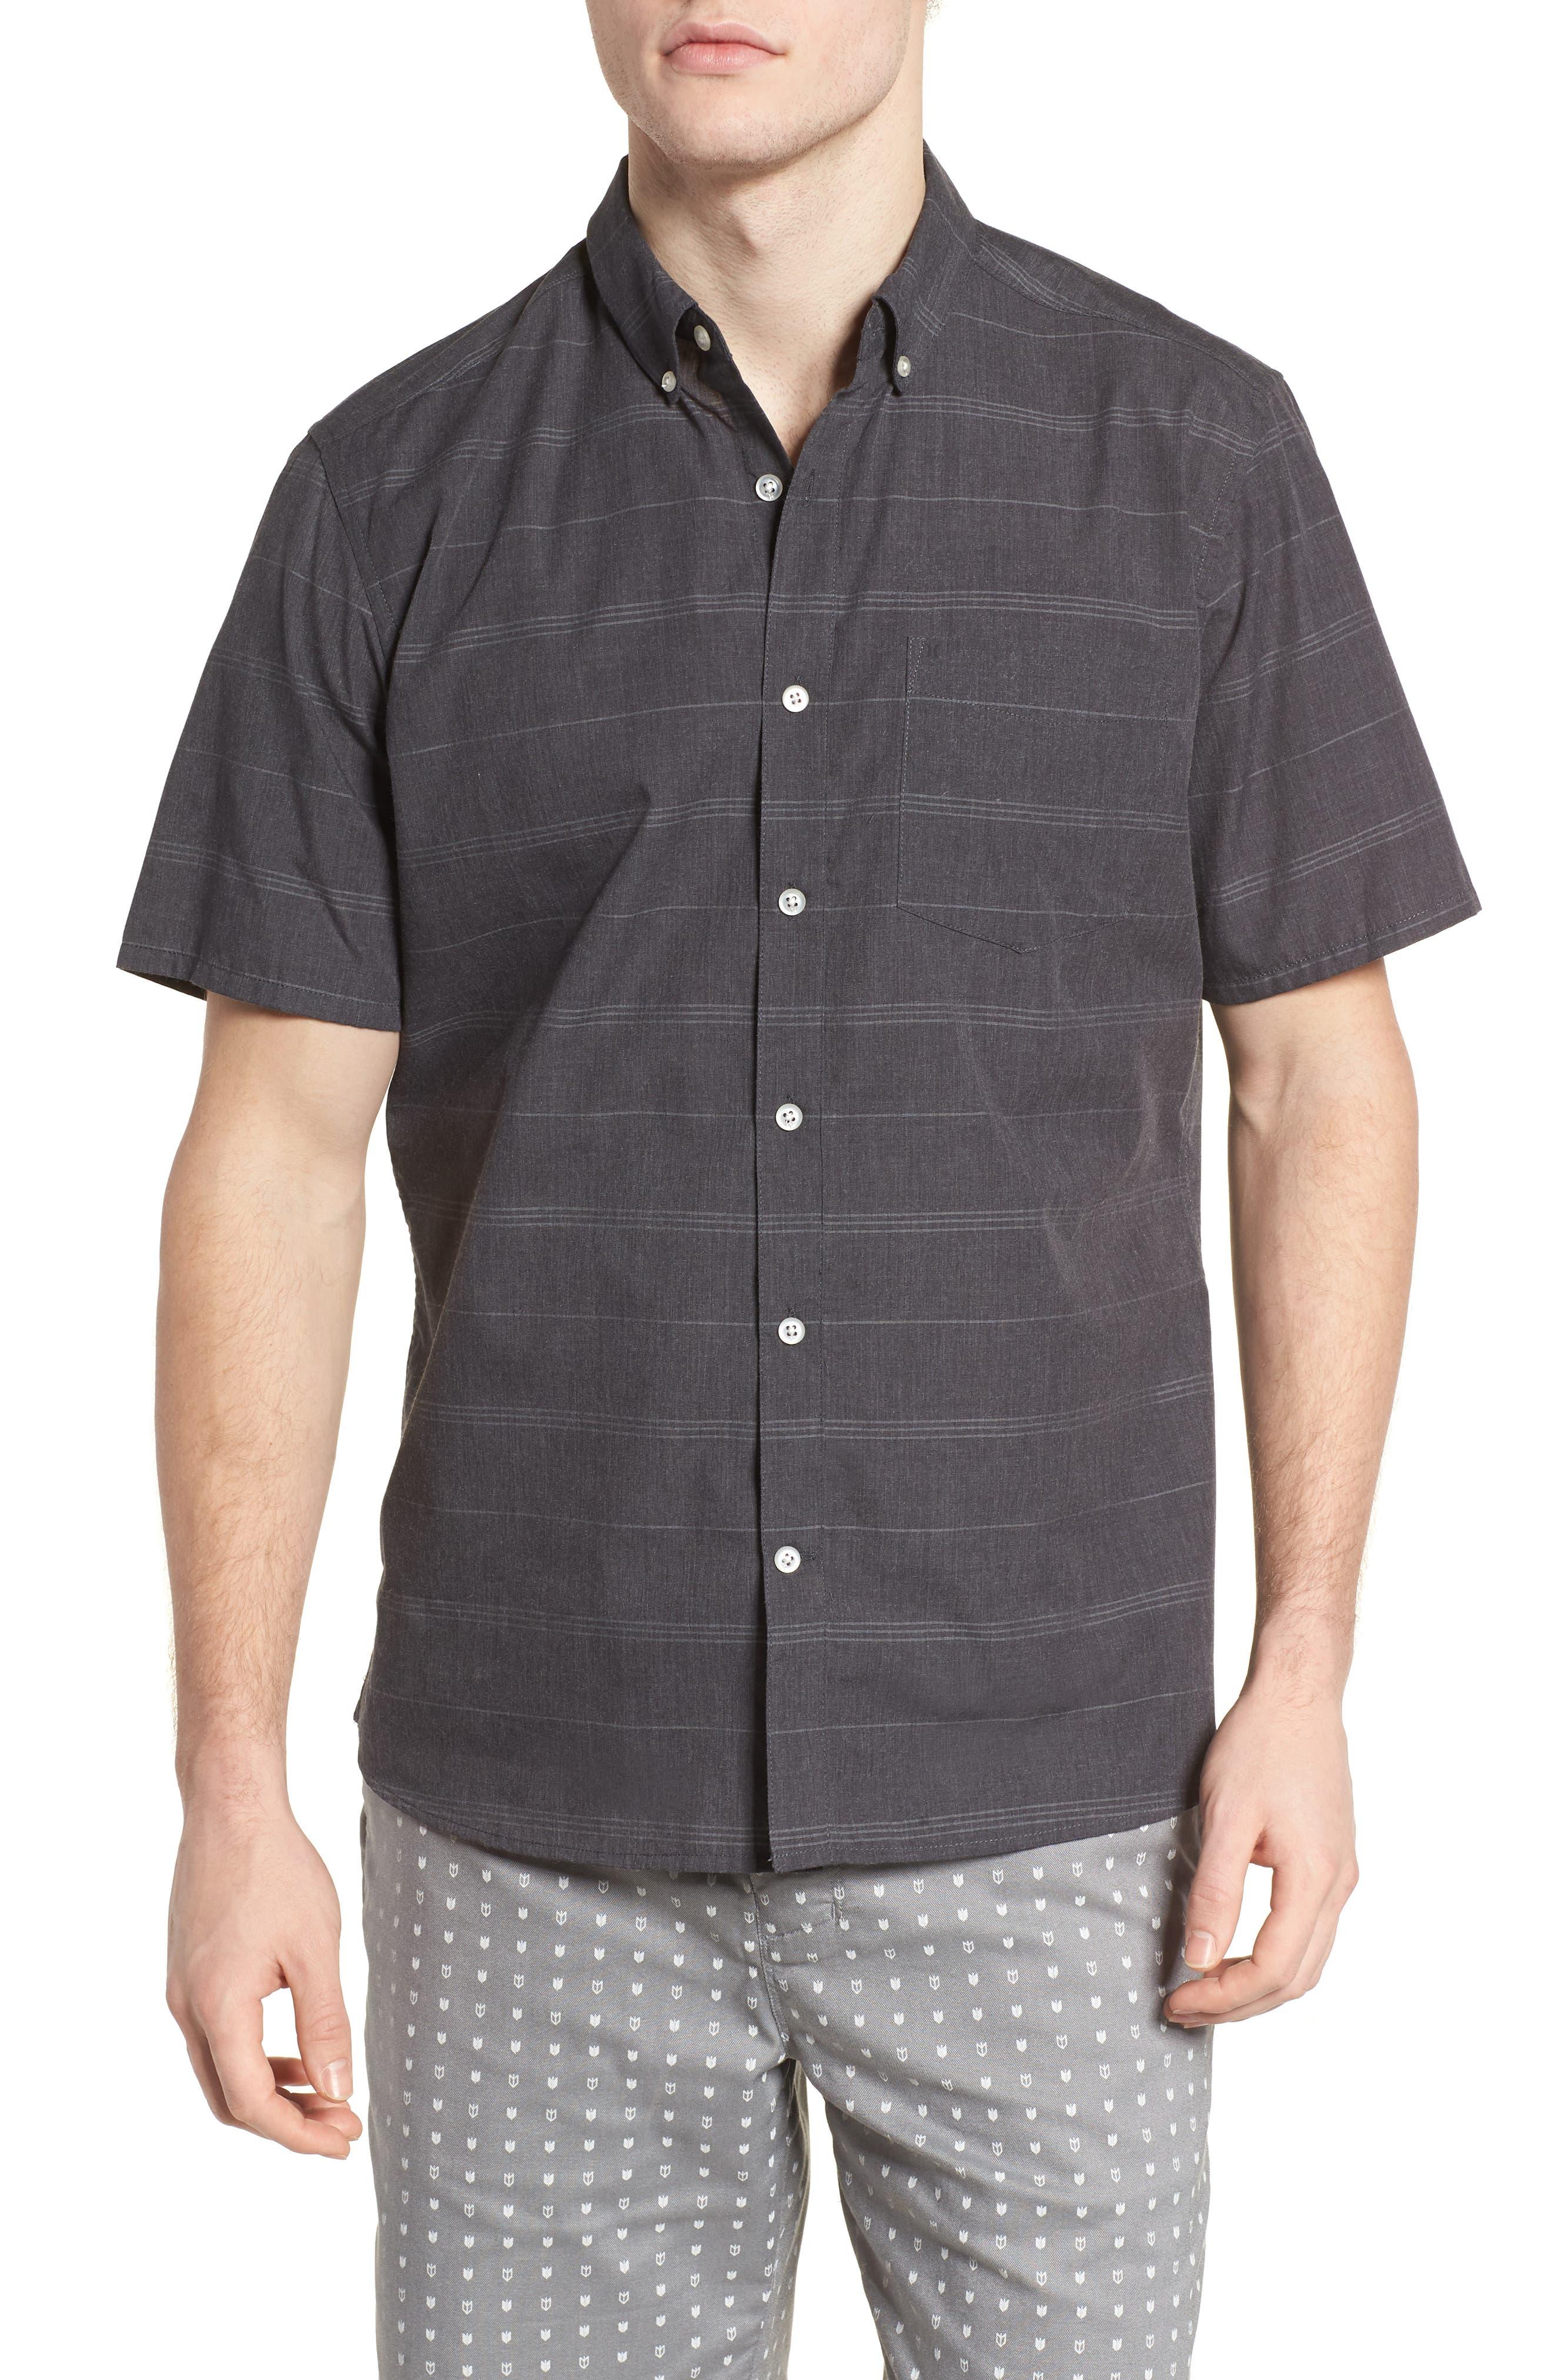 HURLEY,                             Dri-FIT Rhythm Shirt,                             Main thumbnail 1, color,                             010